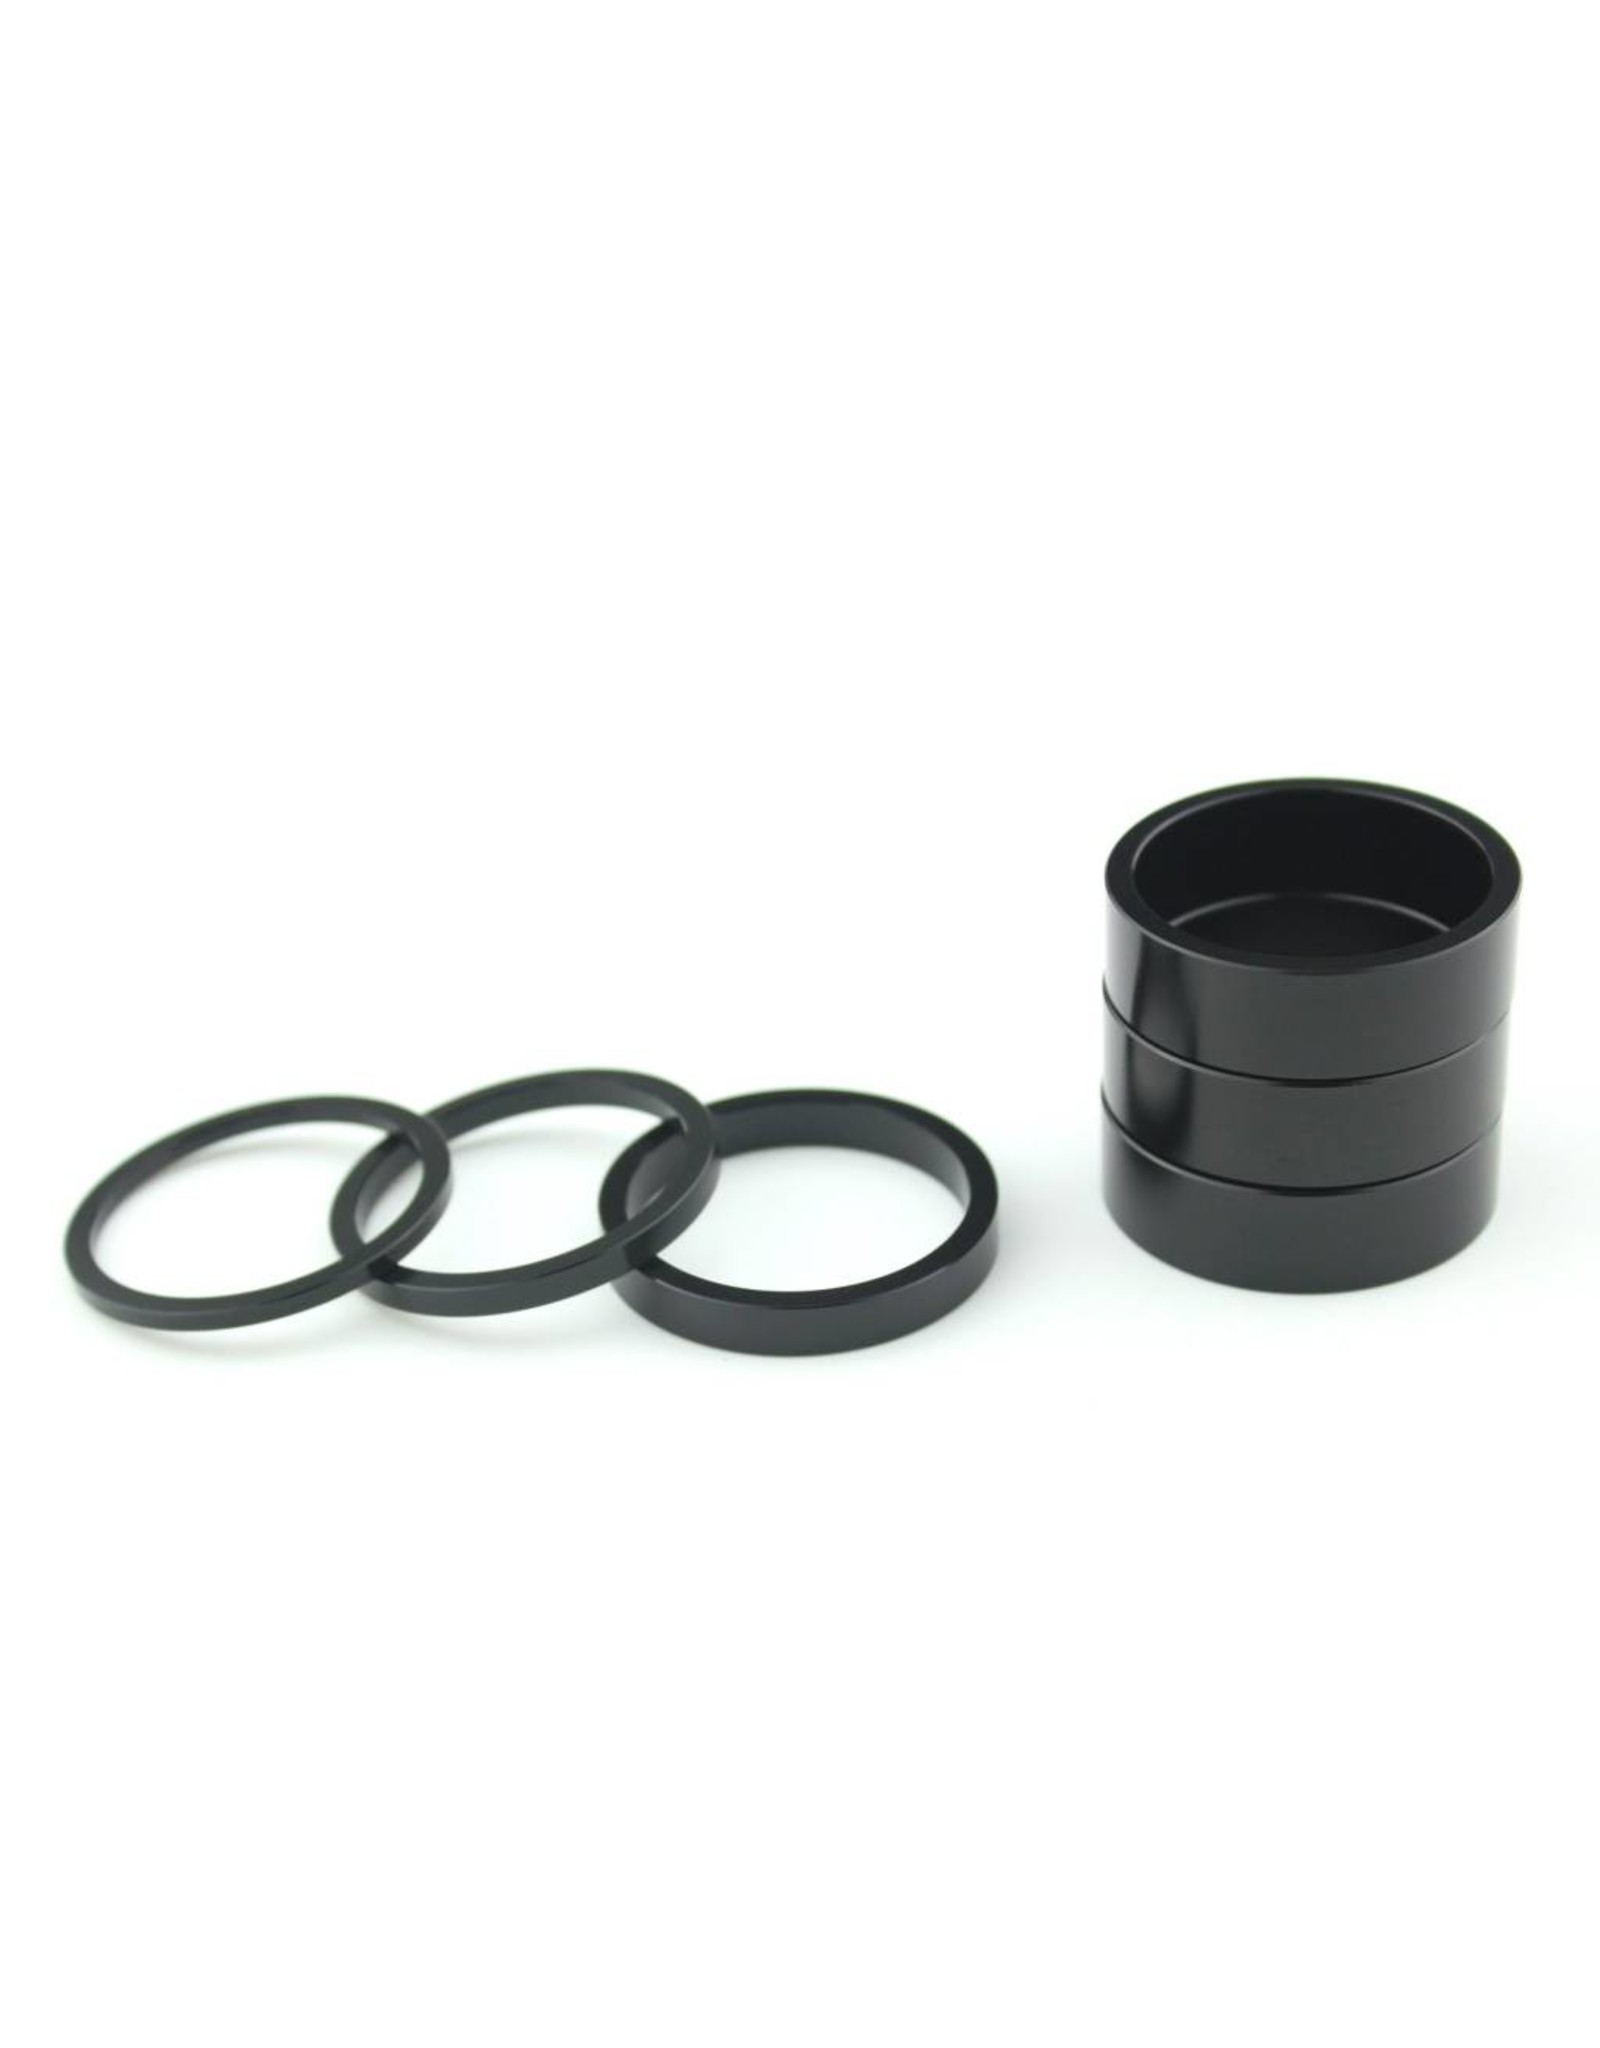 "1.5"" x 3mm Black Headset Spacer"